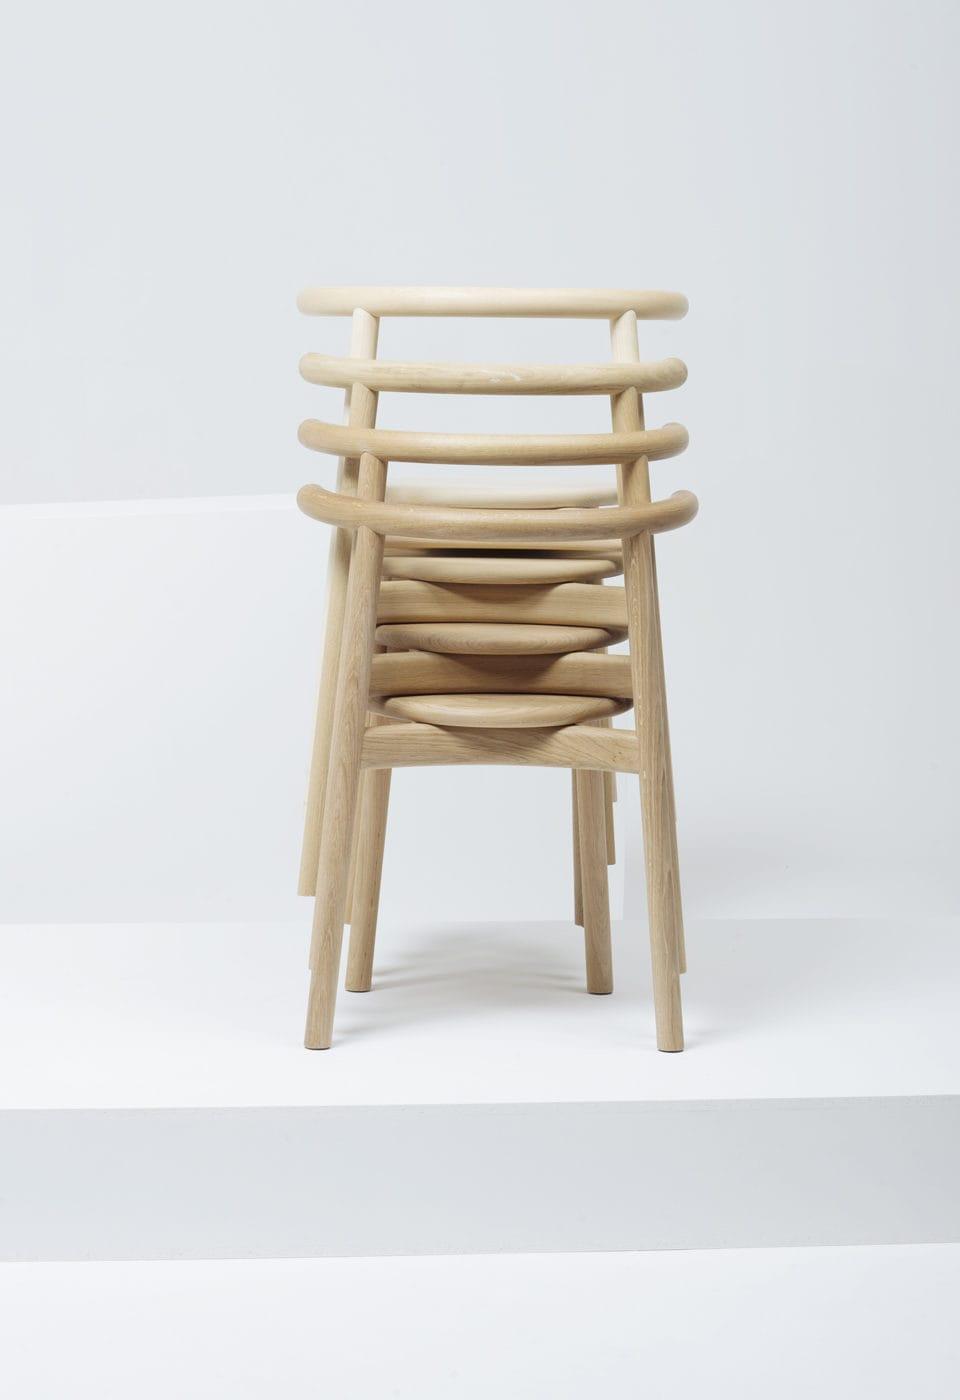 Mc5 Solo Chair By Studio Nitzan Cohen For Mattiazzi